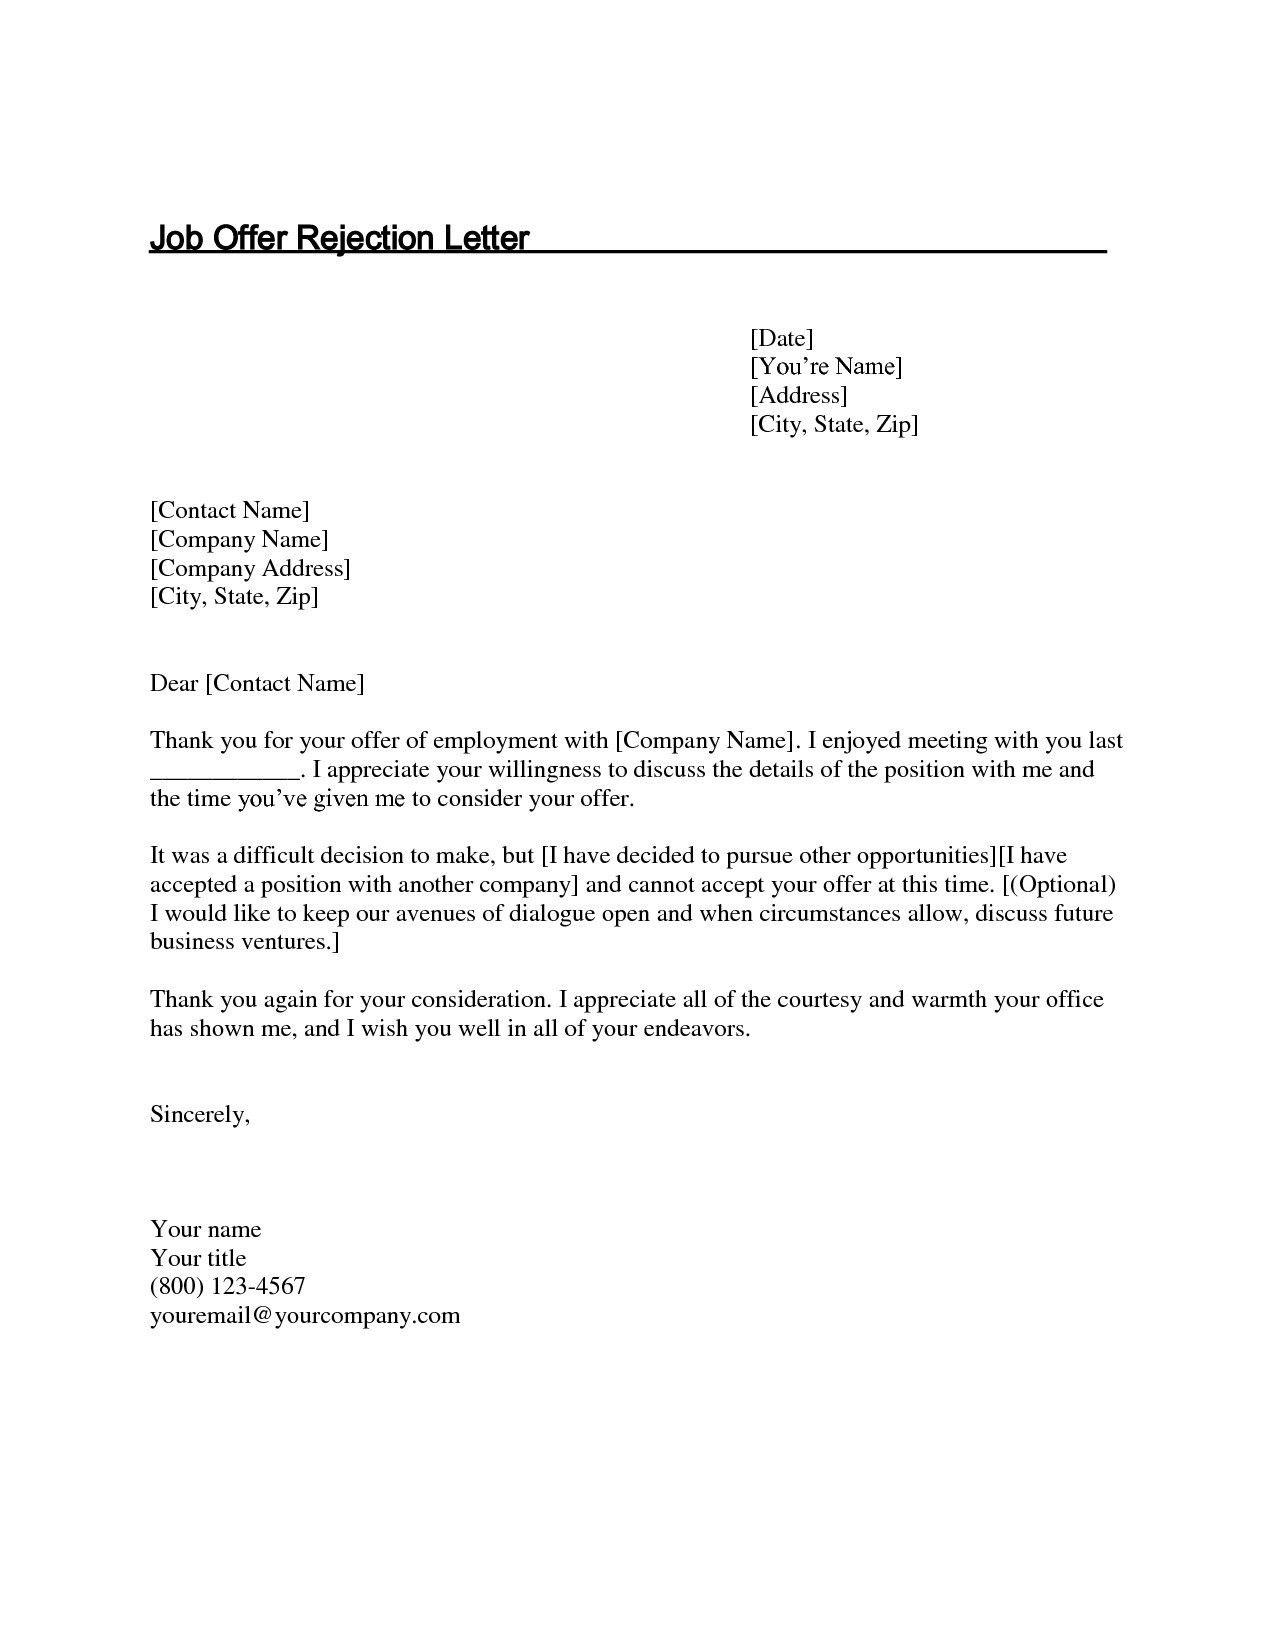 download fresh job decline thank you letter lettersample resume skills digital marketing executive medical office objective